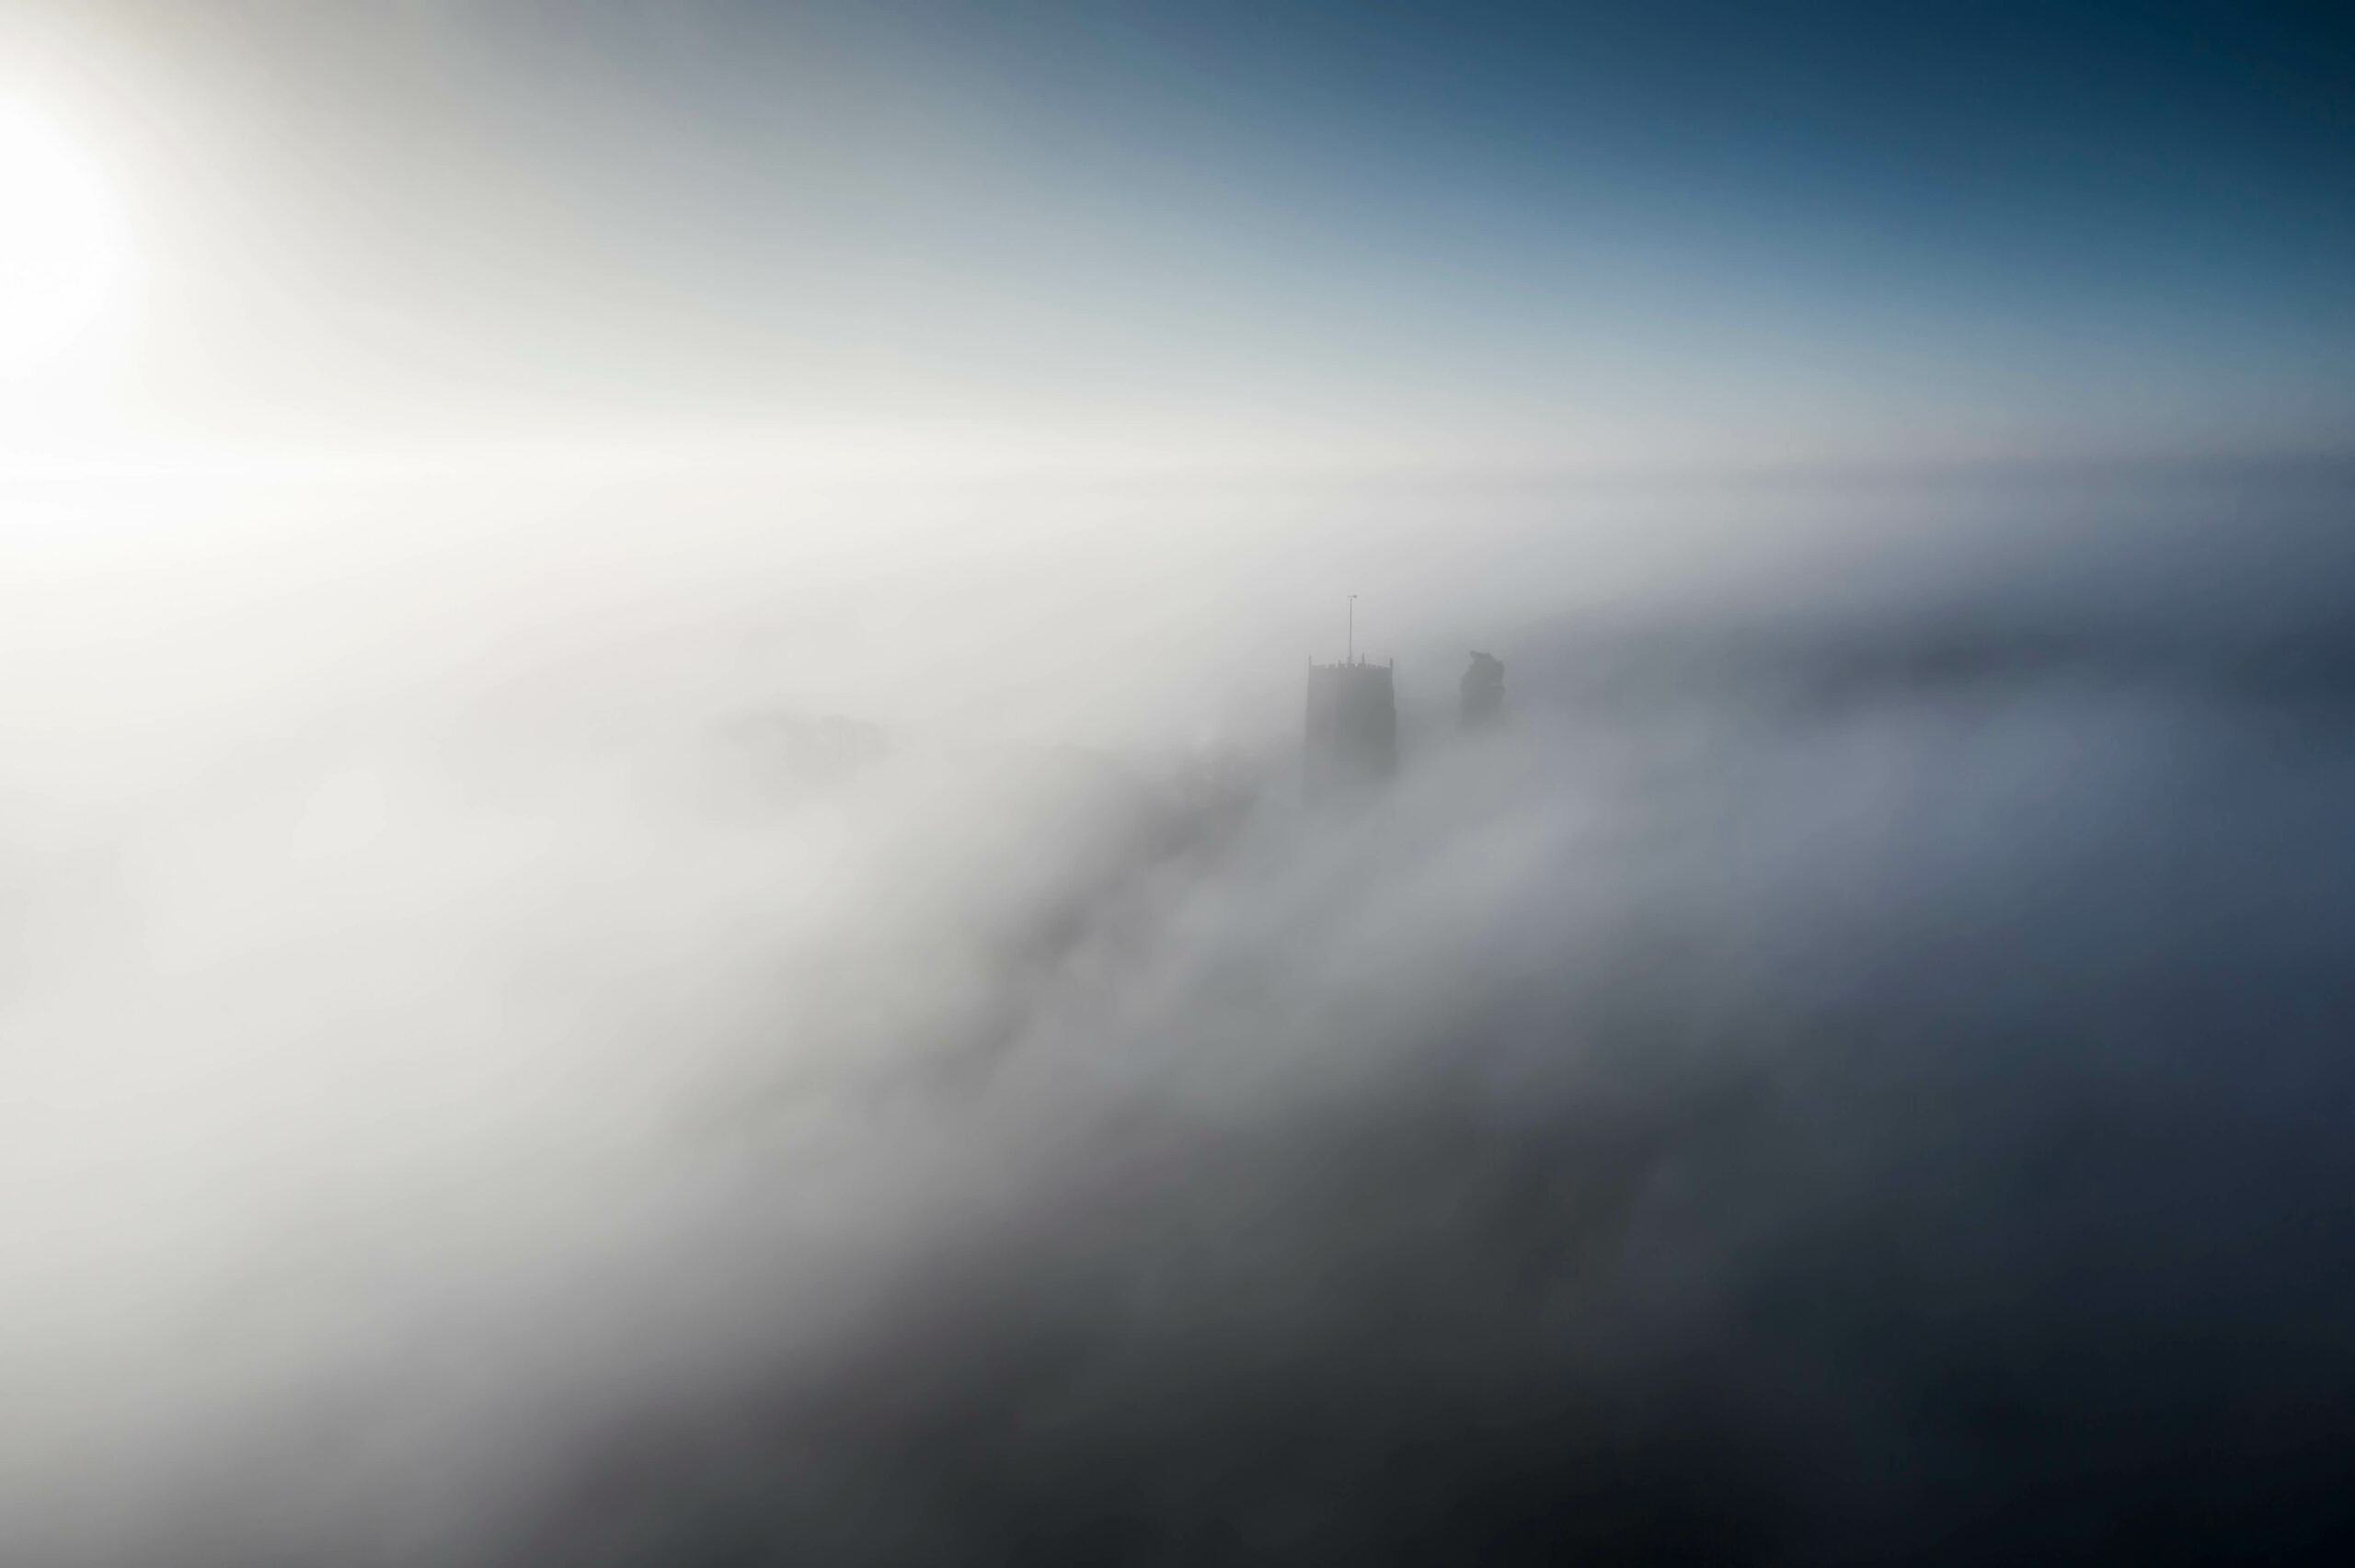 Cloud inversion at St Michael's Church, Framlingham